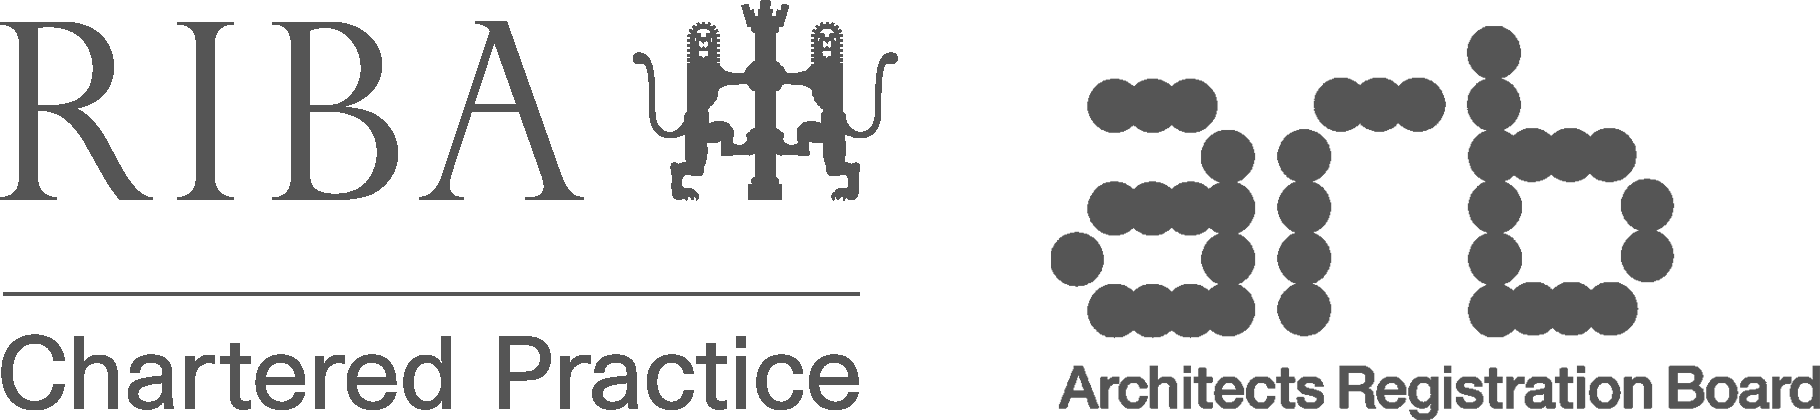 RIBA and ARB logos